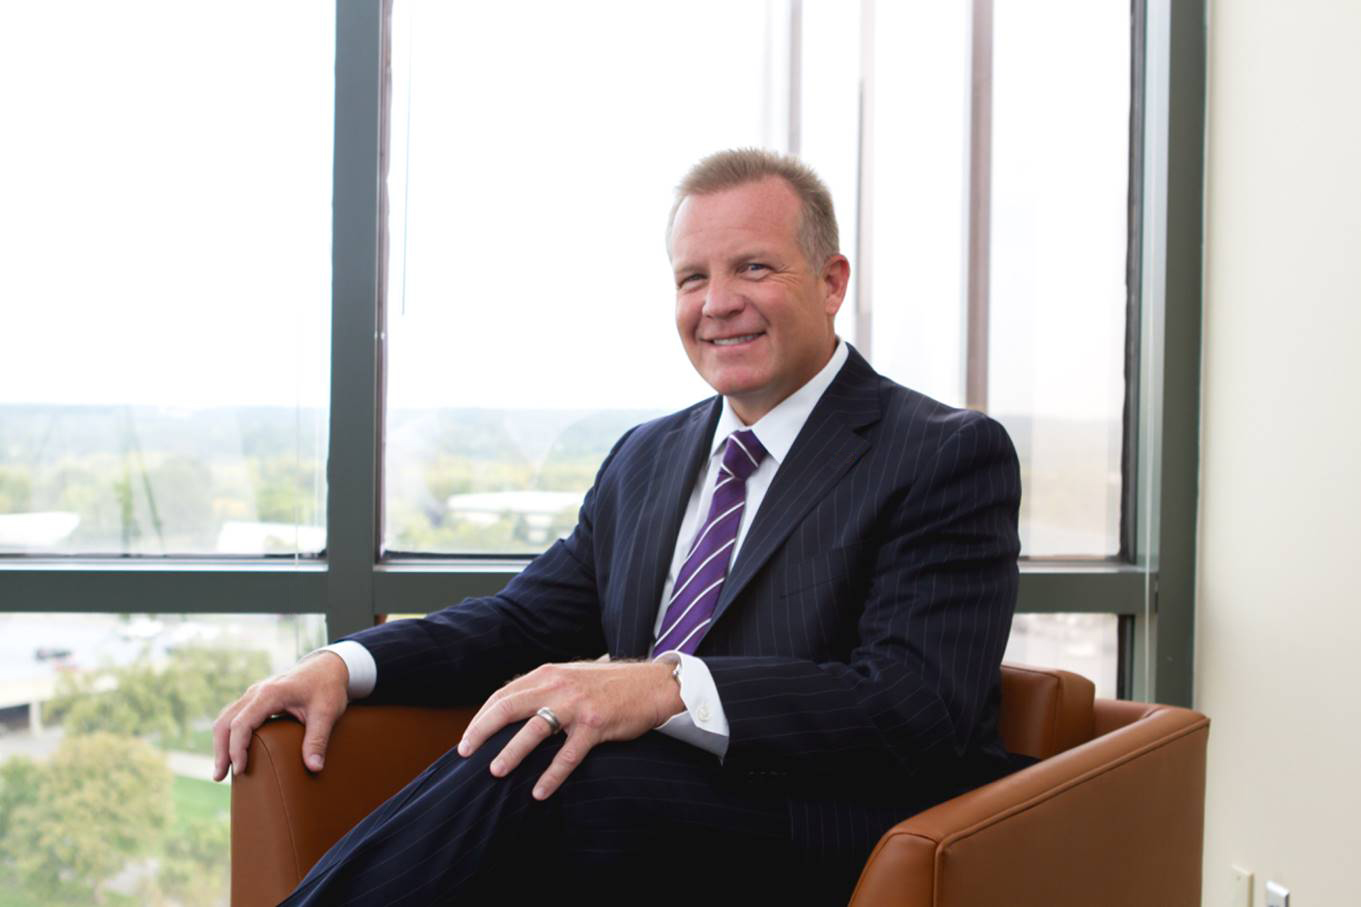 Platform Fuels Welcomes New CEO Steve Wambold